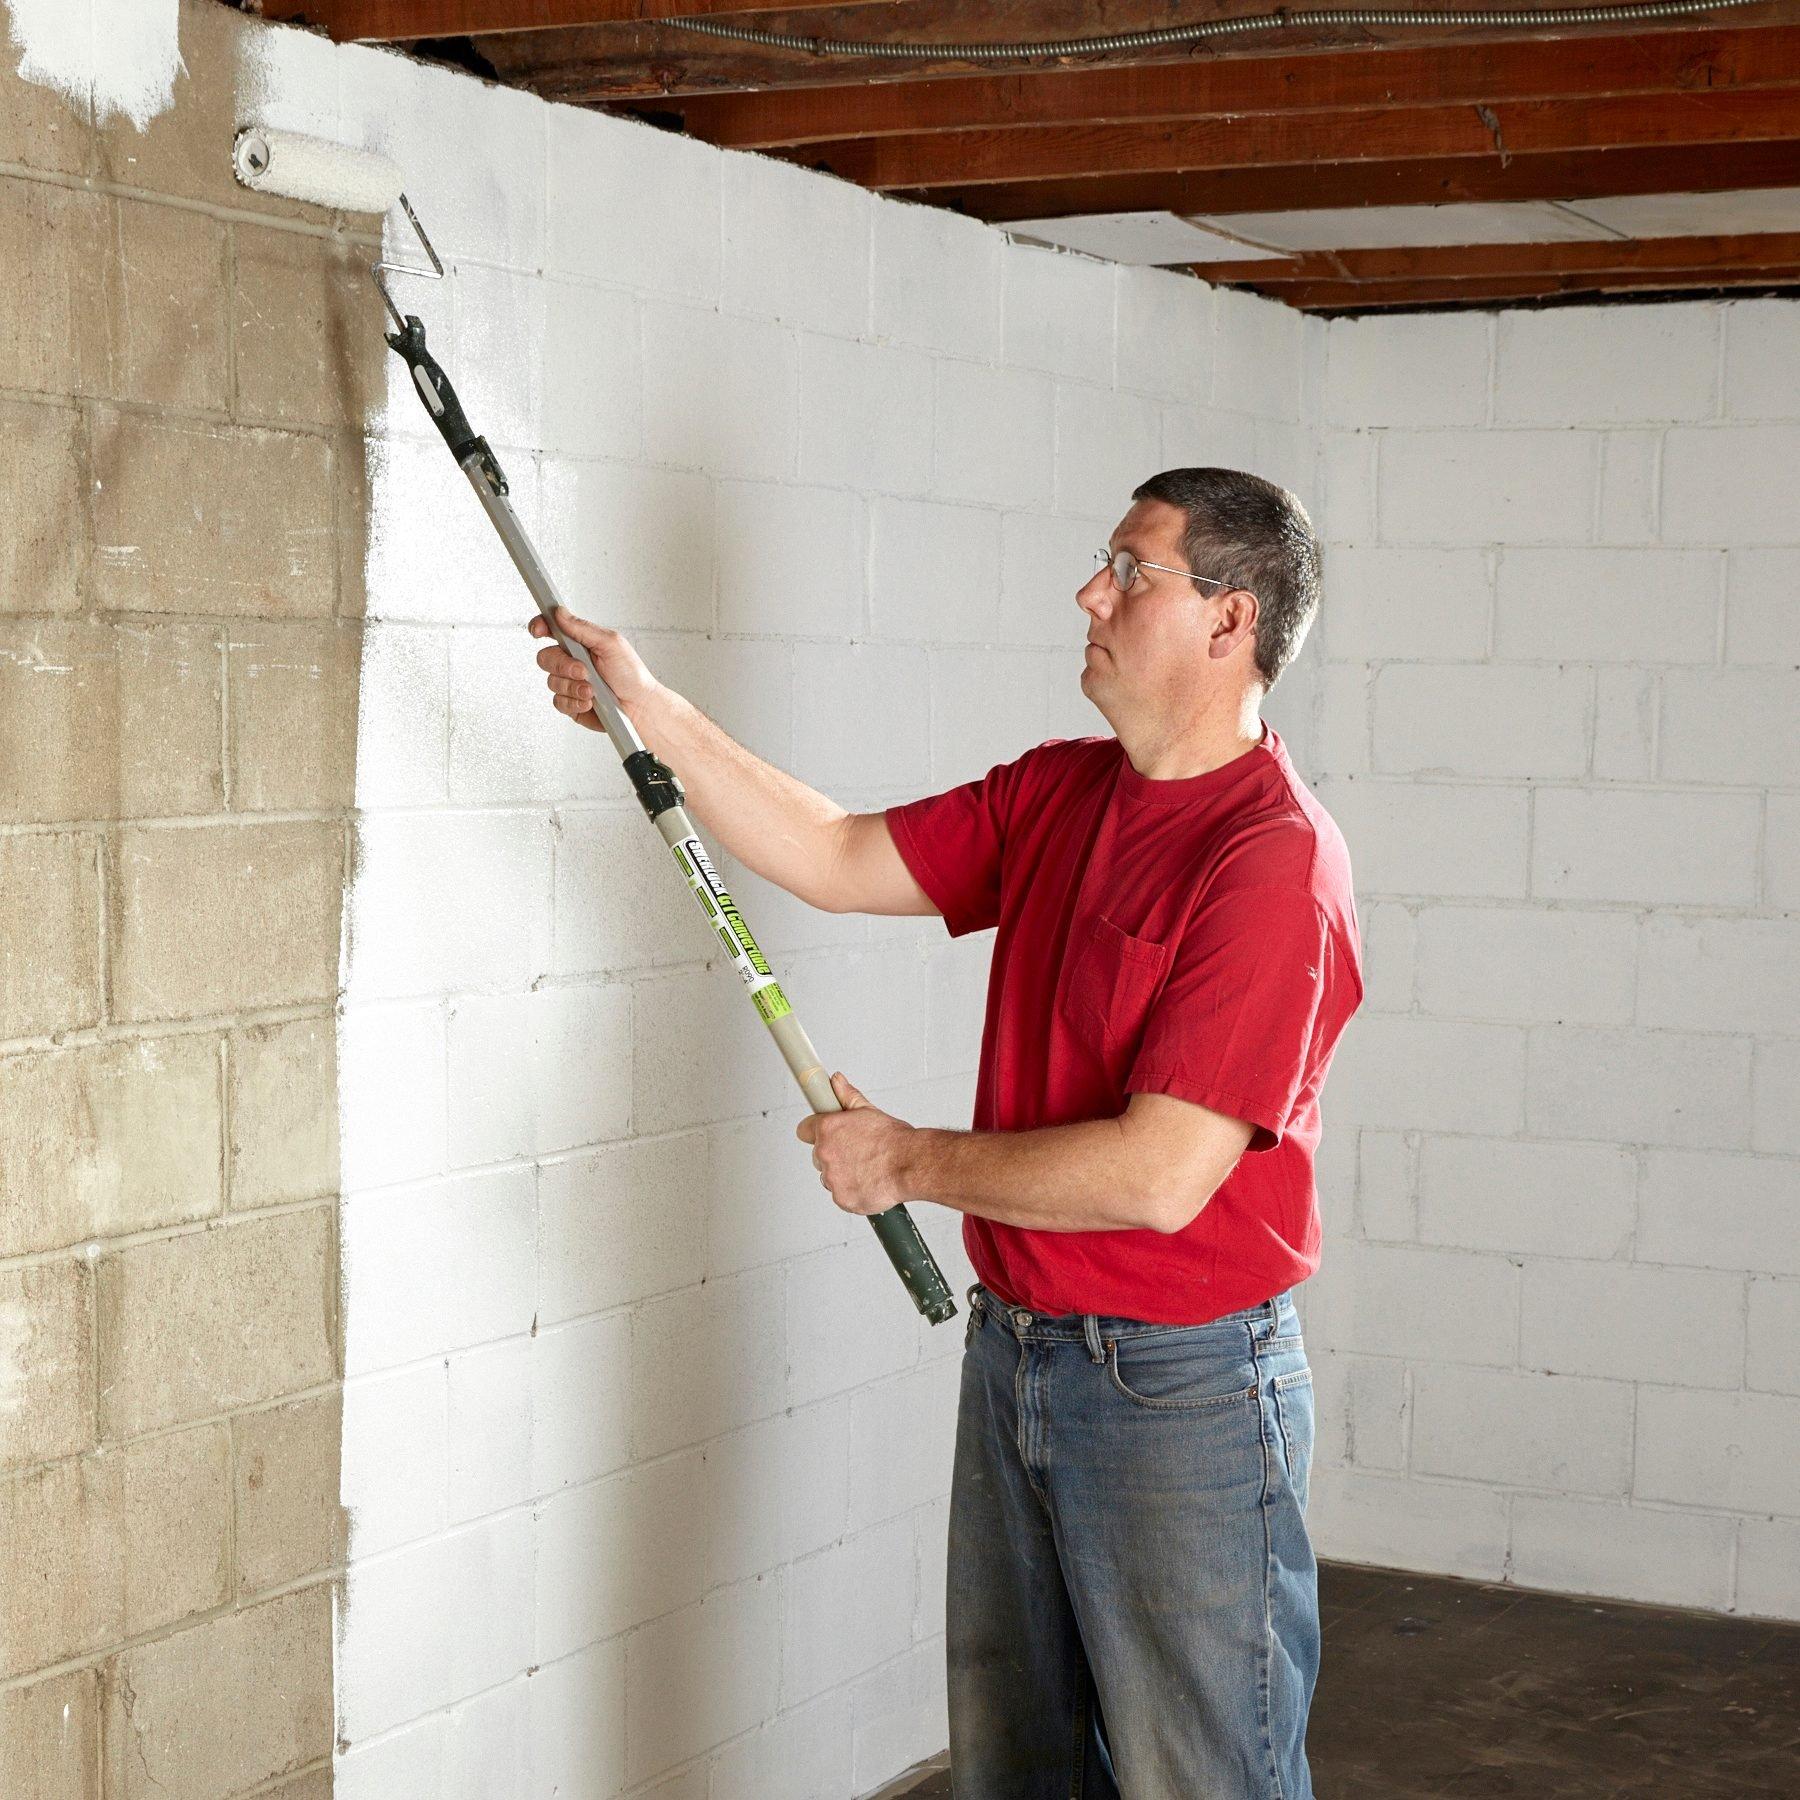 How To Finish A Basement Wall Diy Family Handyman